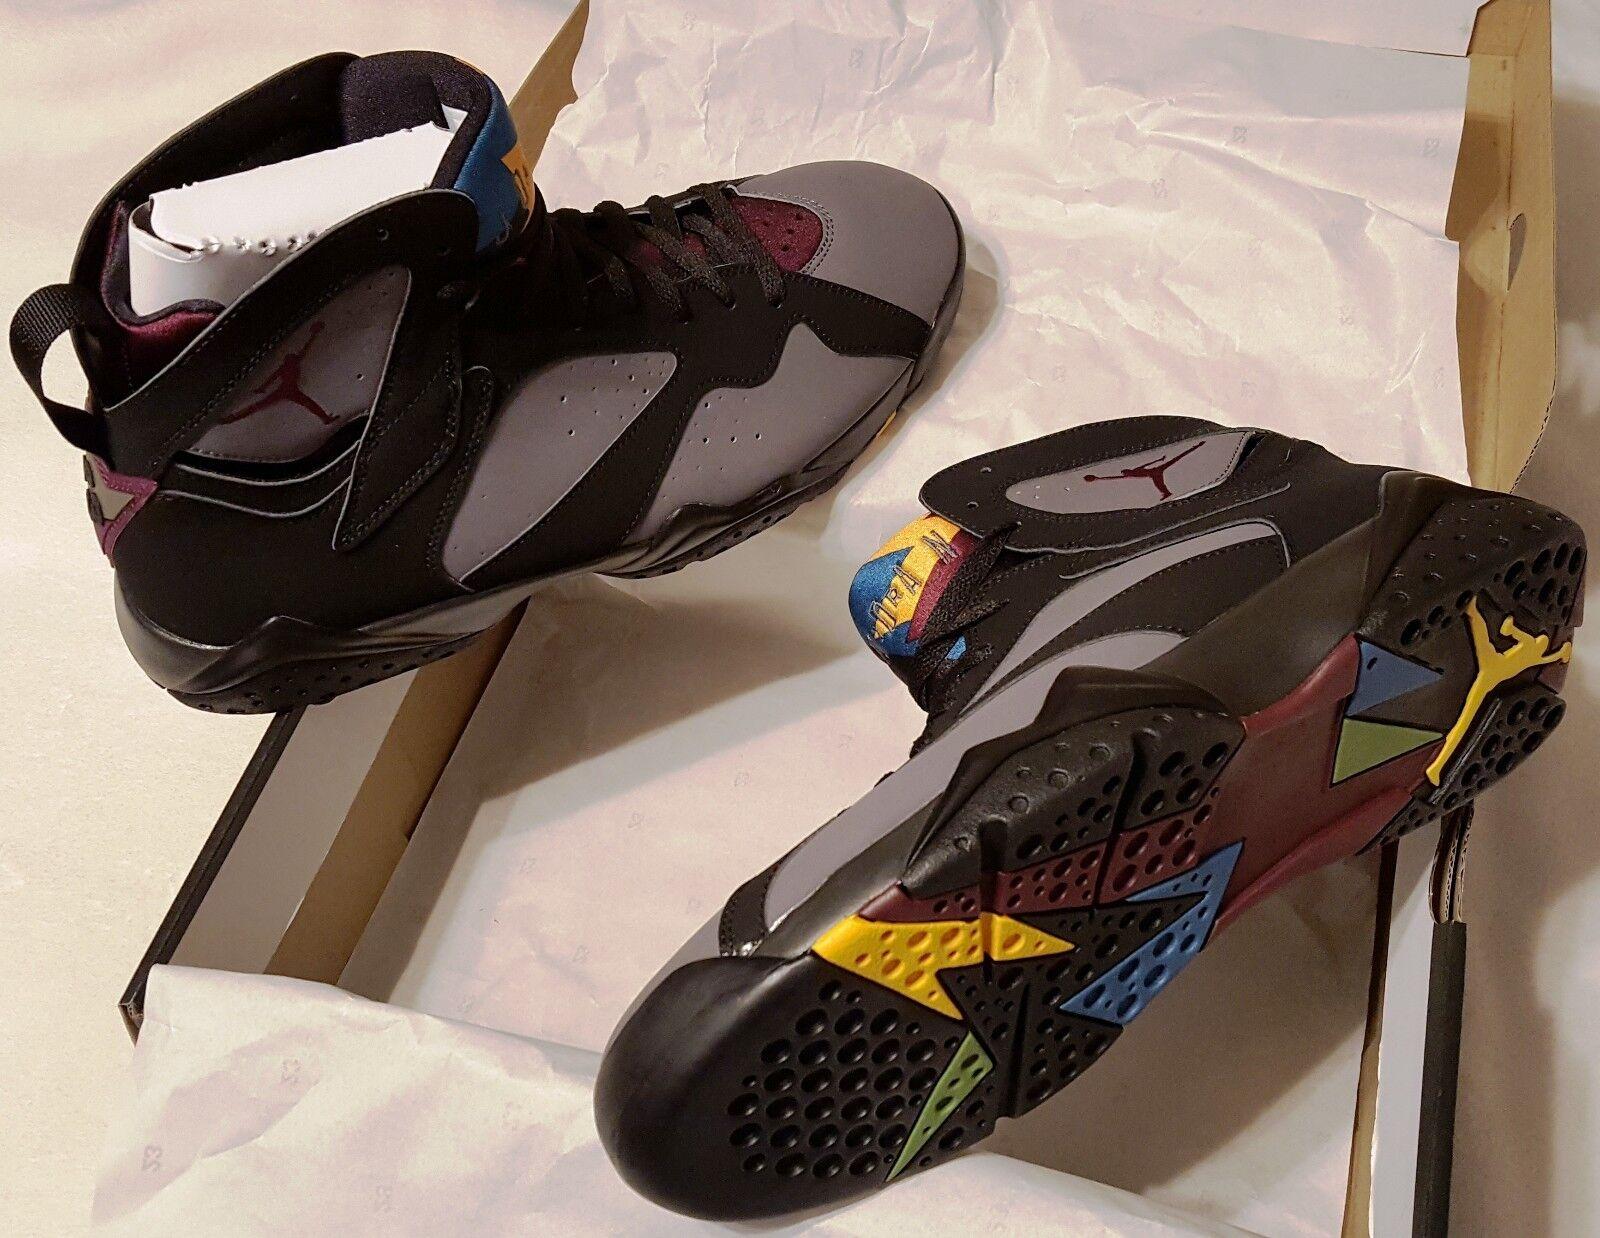 Jordan 7 Bordeaux Size 12 Mens New In Box Basketball Nike Air Retro 2015